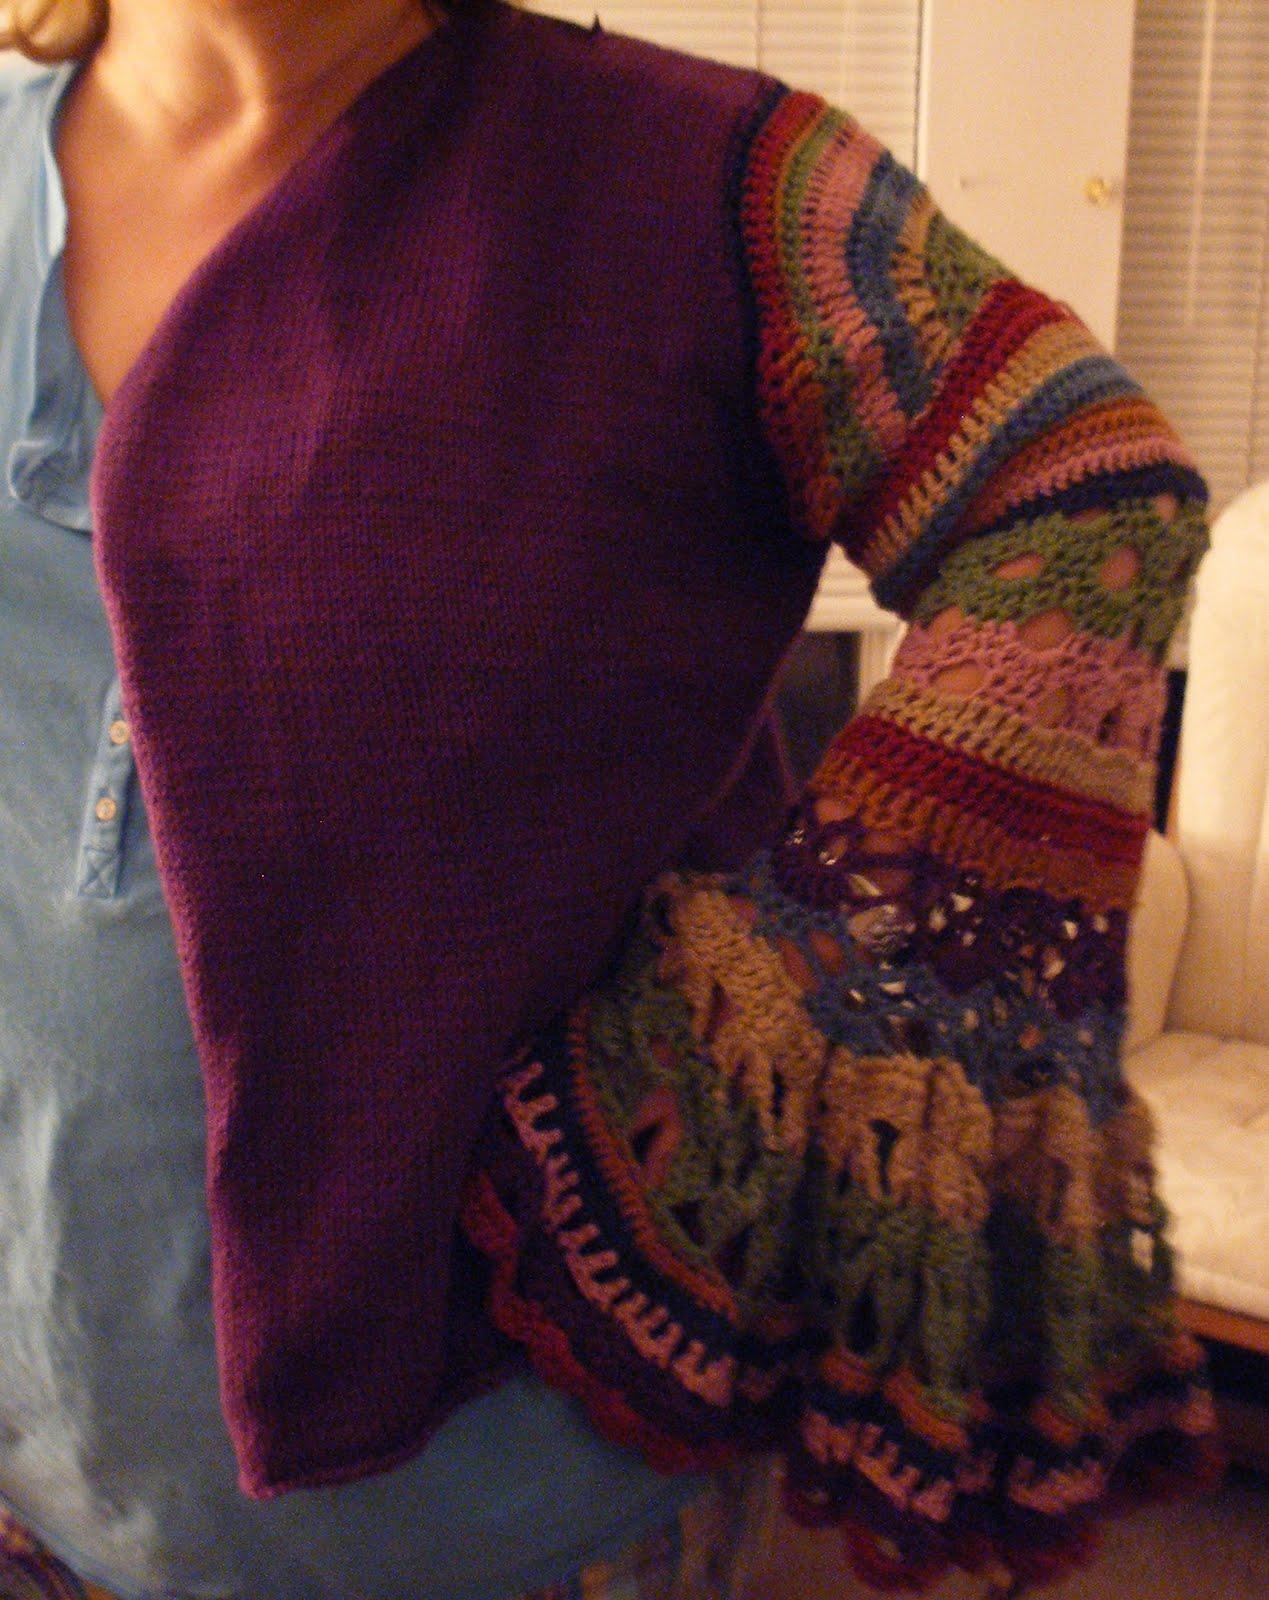 Rediscovering Heirlooms: Molly Weasley Sweater Update #2